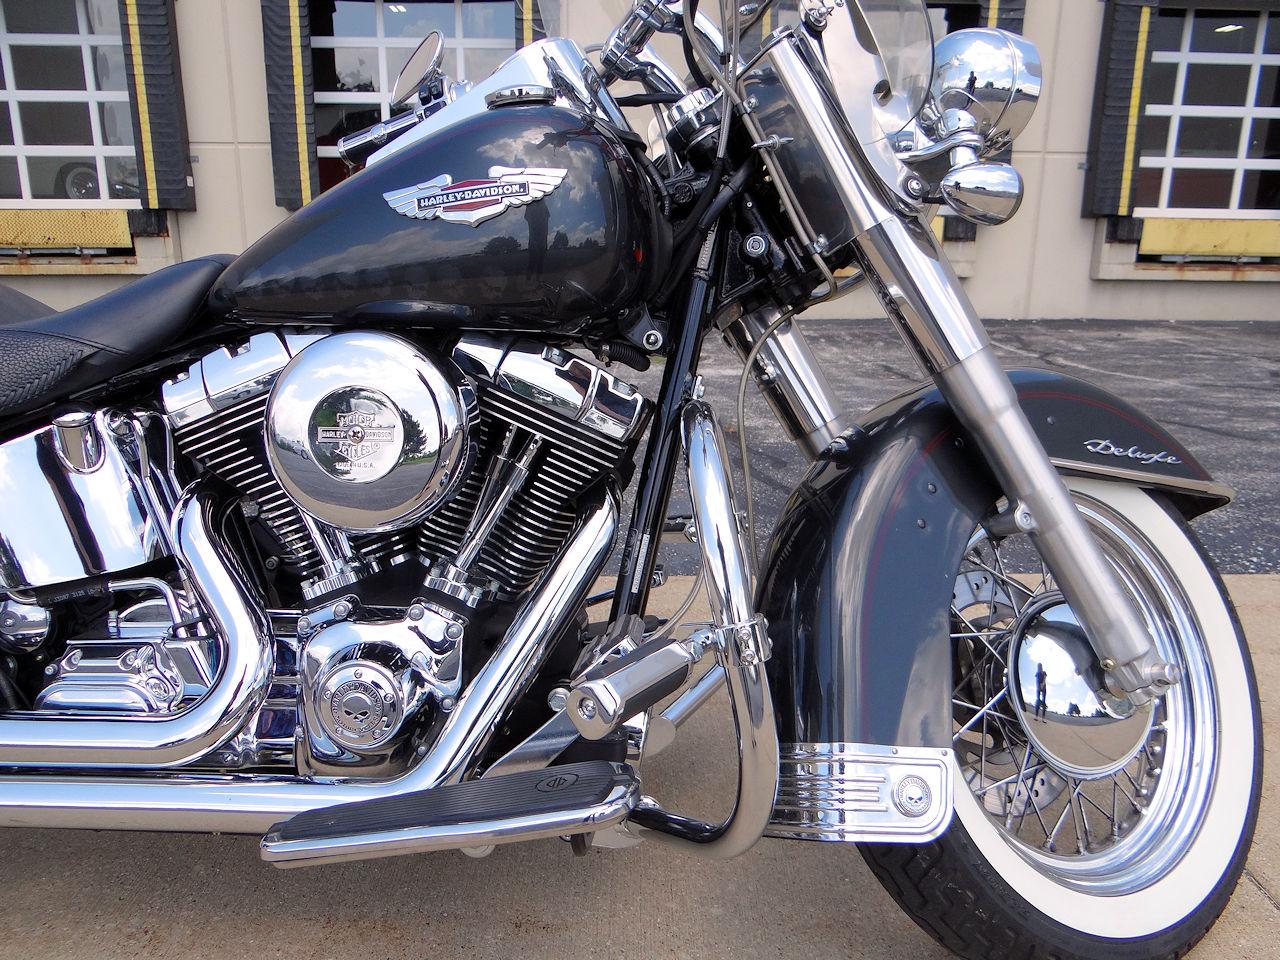 2006 Harley Davidson FLSTNI 46